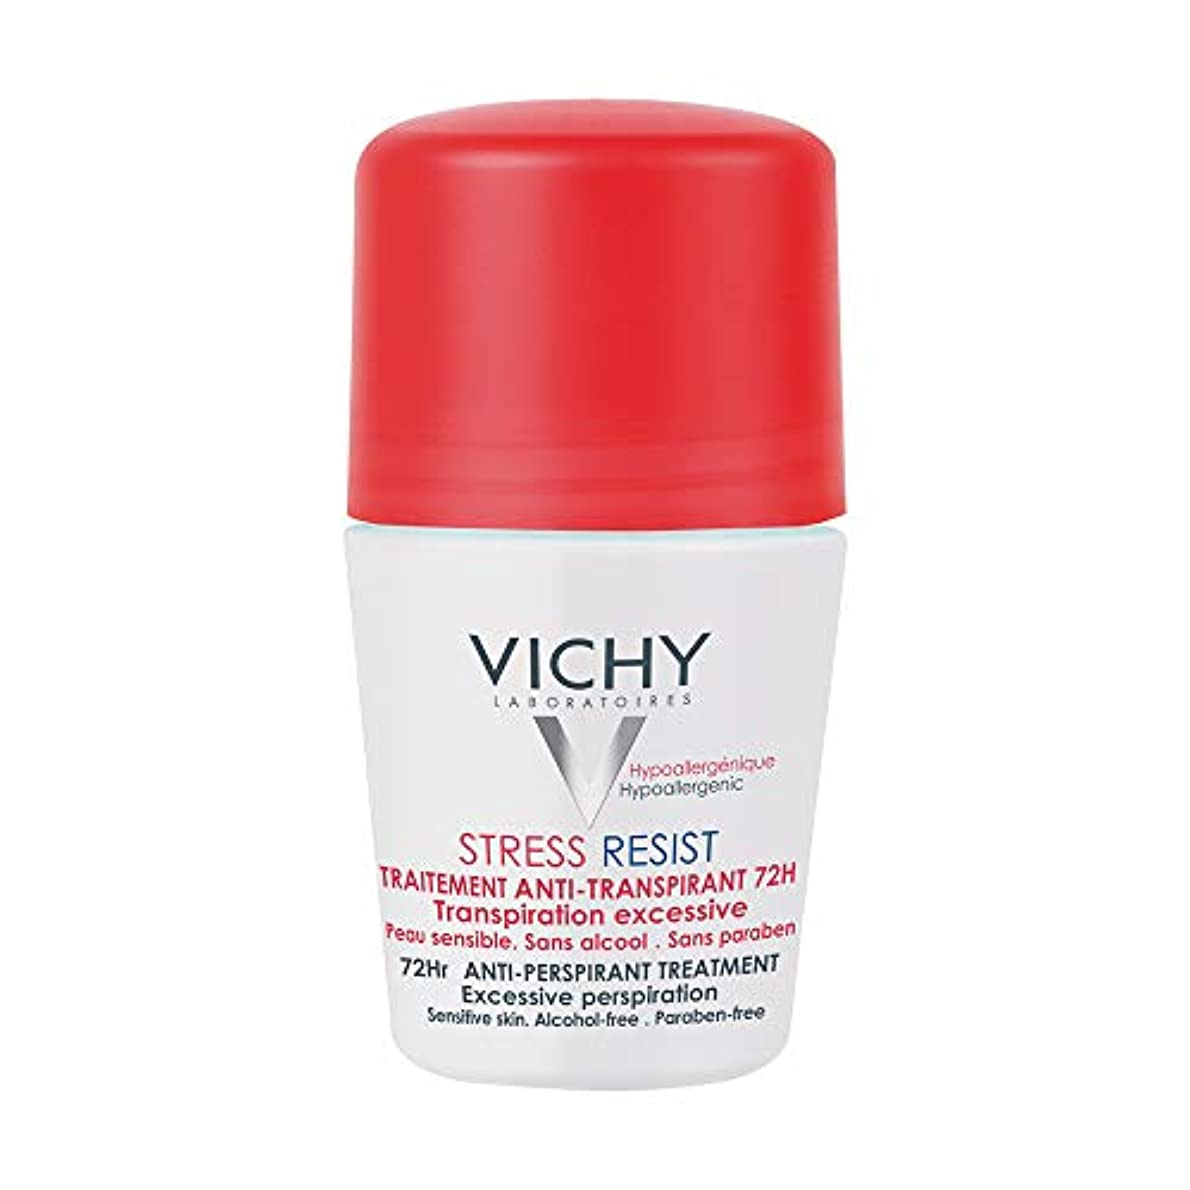 Vichy Deo Stress Resist Intense Perspiration 50ml